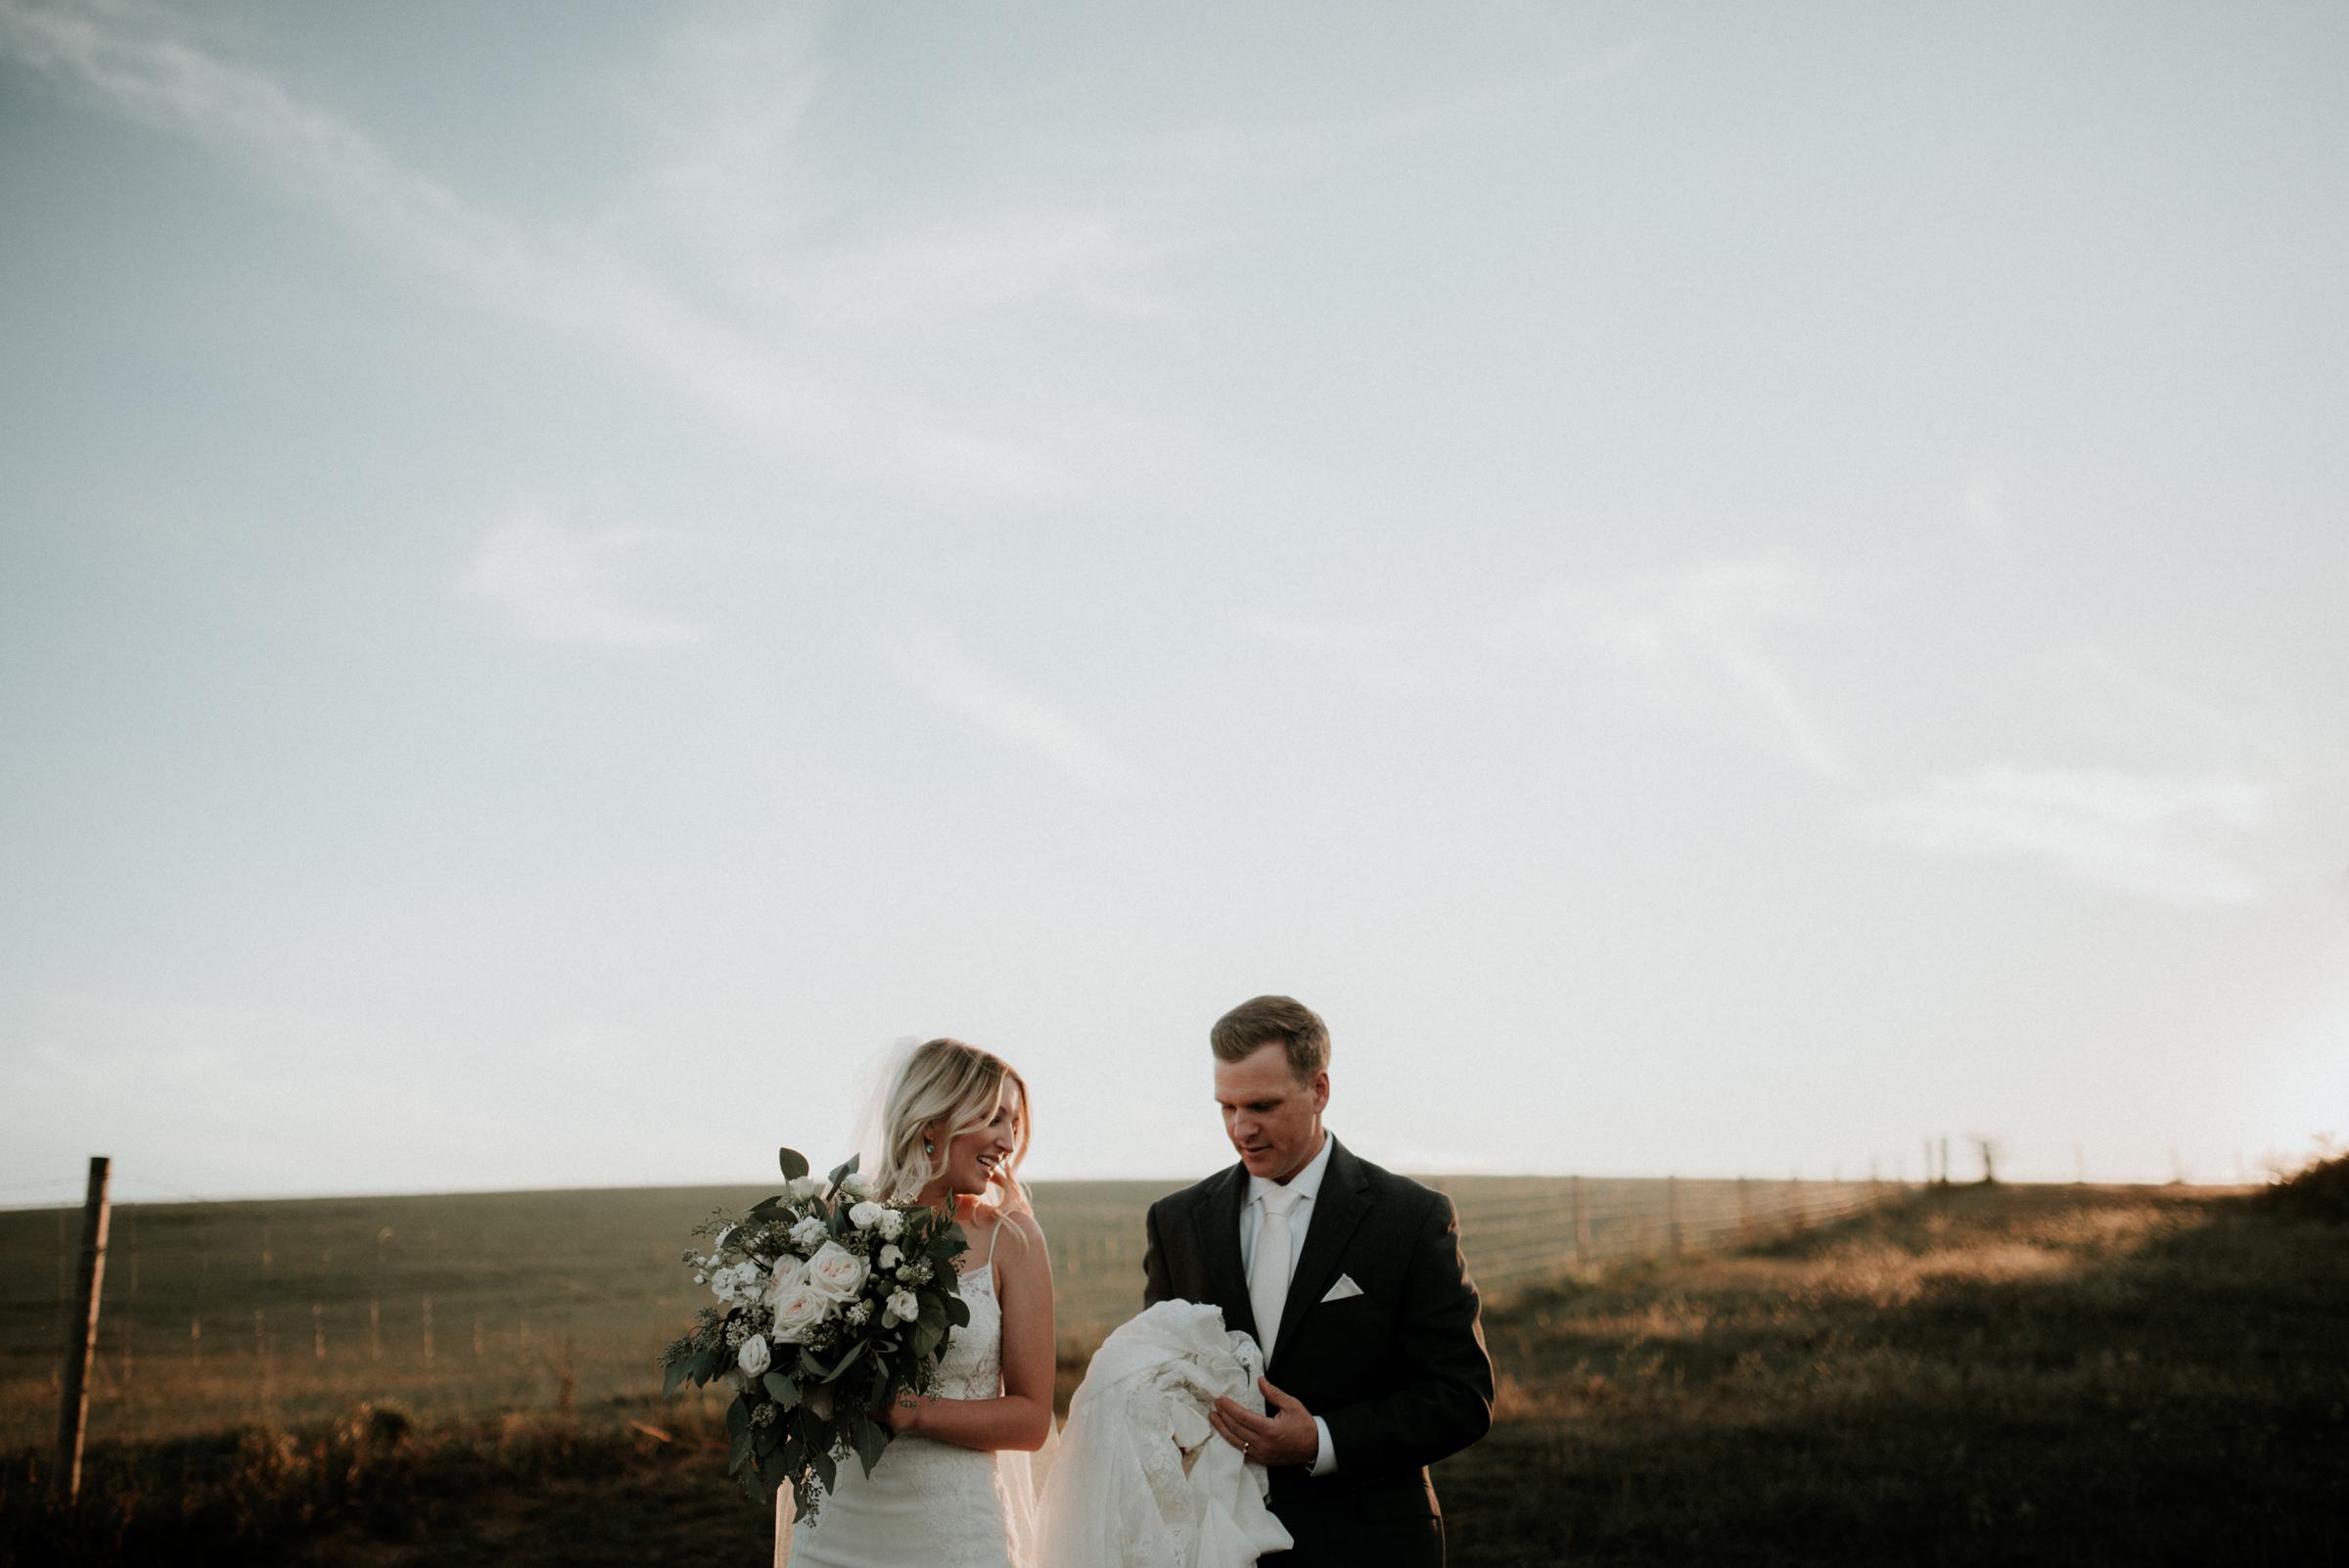 Zach&Rosalie Marion St. Louis Wedding Photographer-0678.jpg